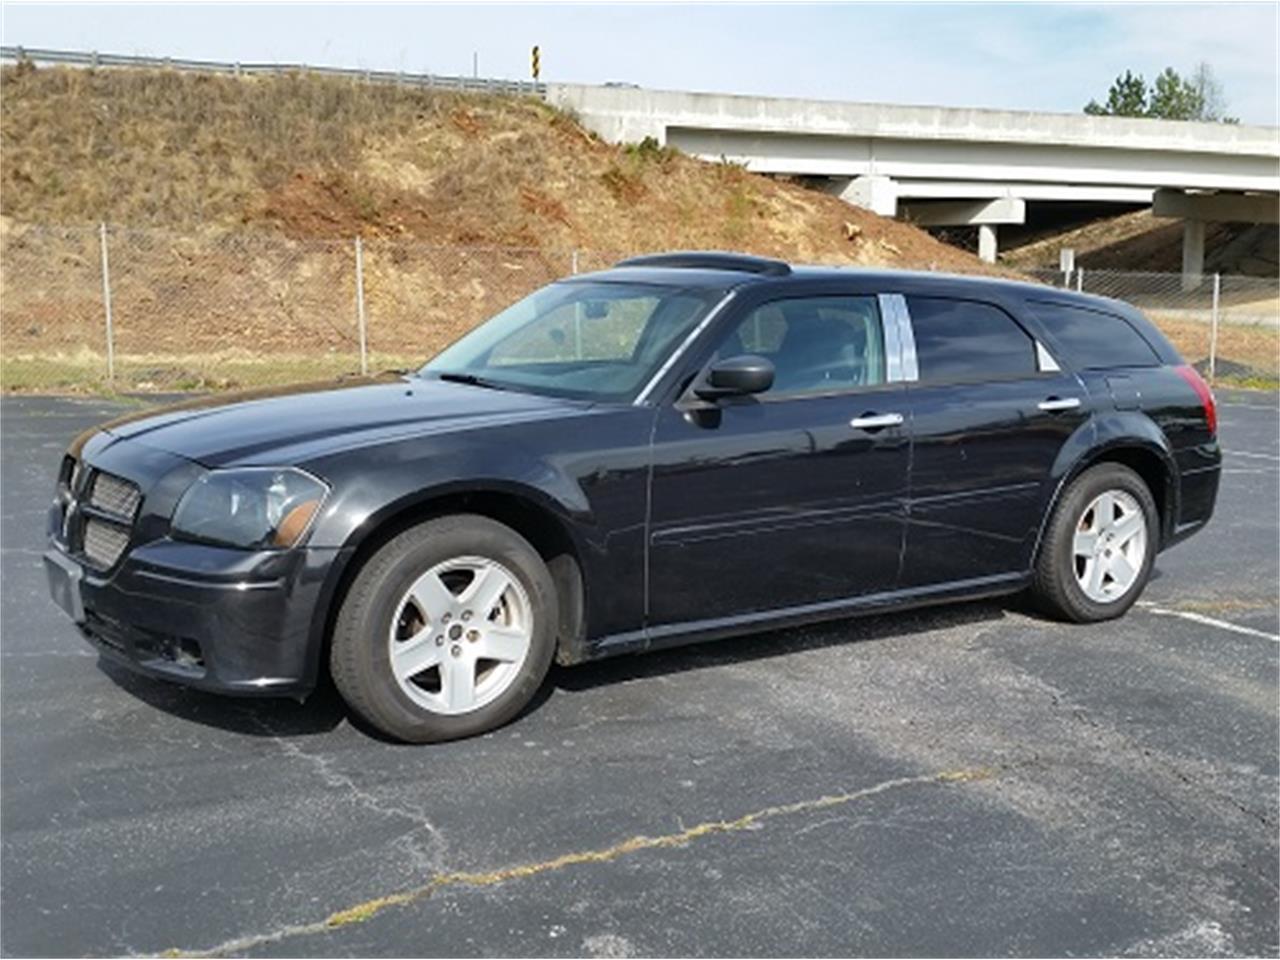 Dodge Magnum For Sale Near Me >> 2005 Dodge Magnum For Sale Classiccars Com Cc 1163501